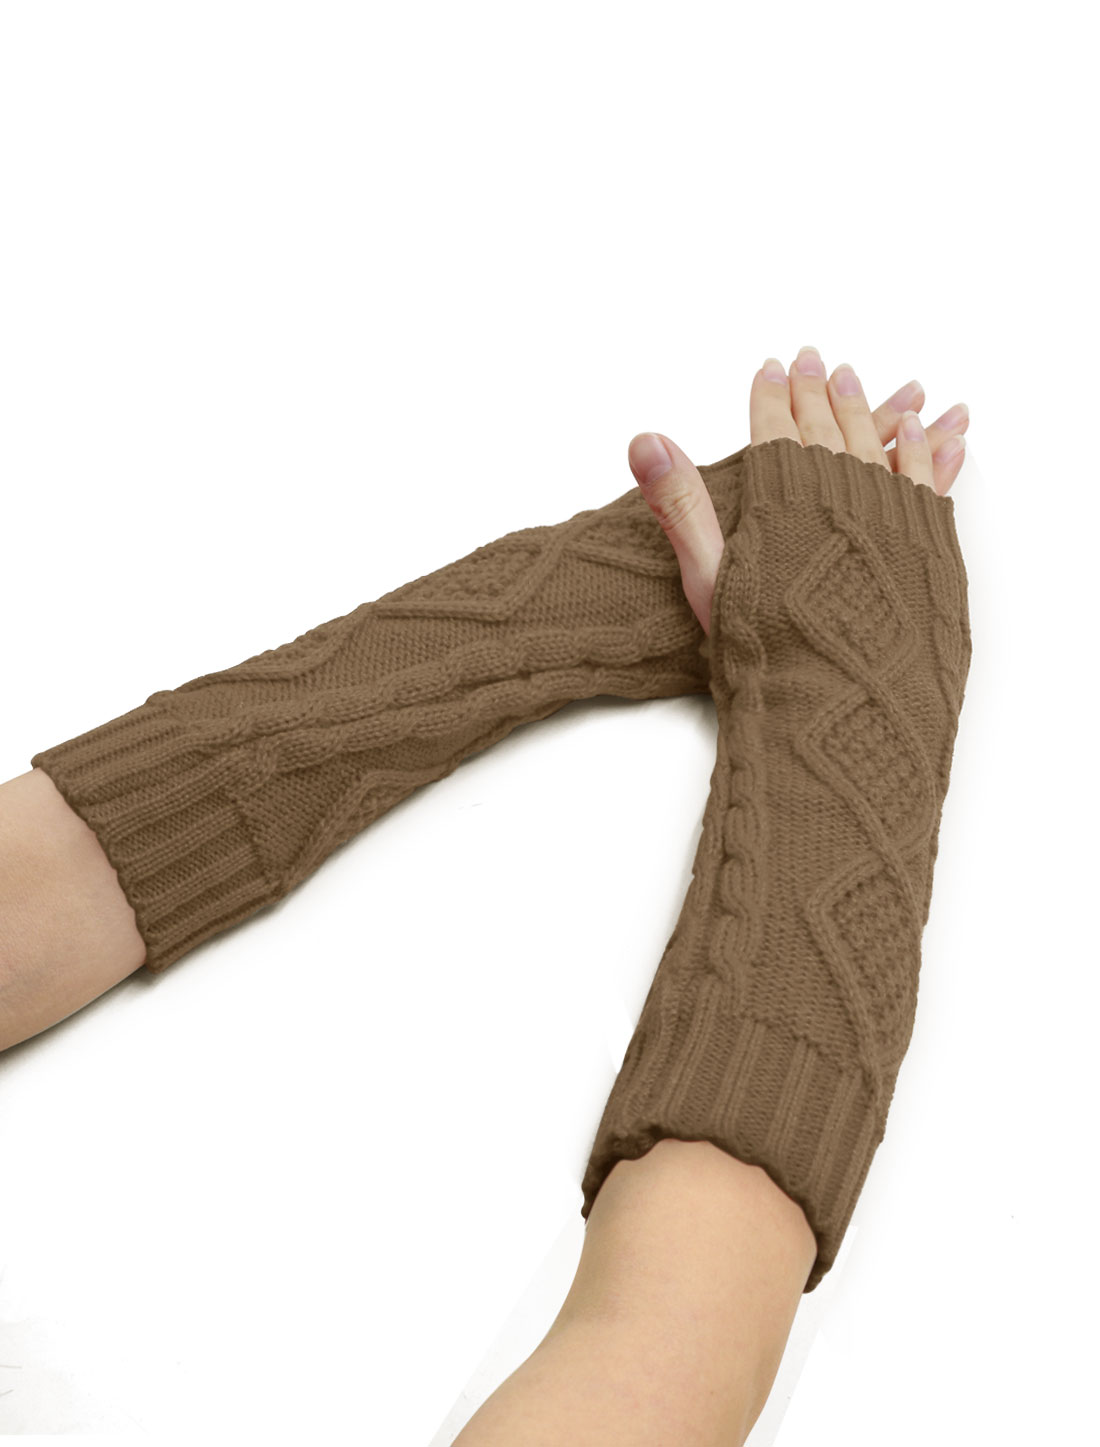 Women Elbow Length Argyle Design Cable Knit Arm Warmers Pair Brown